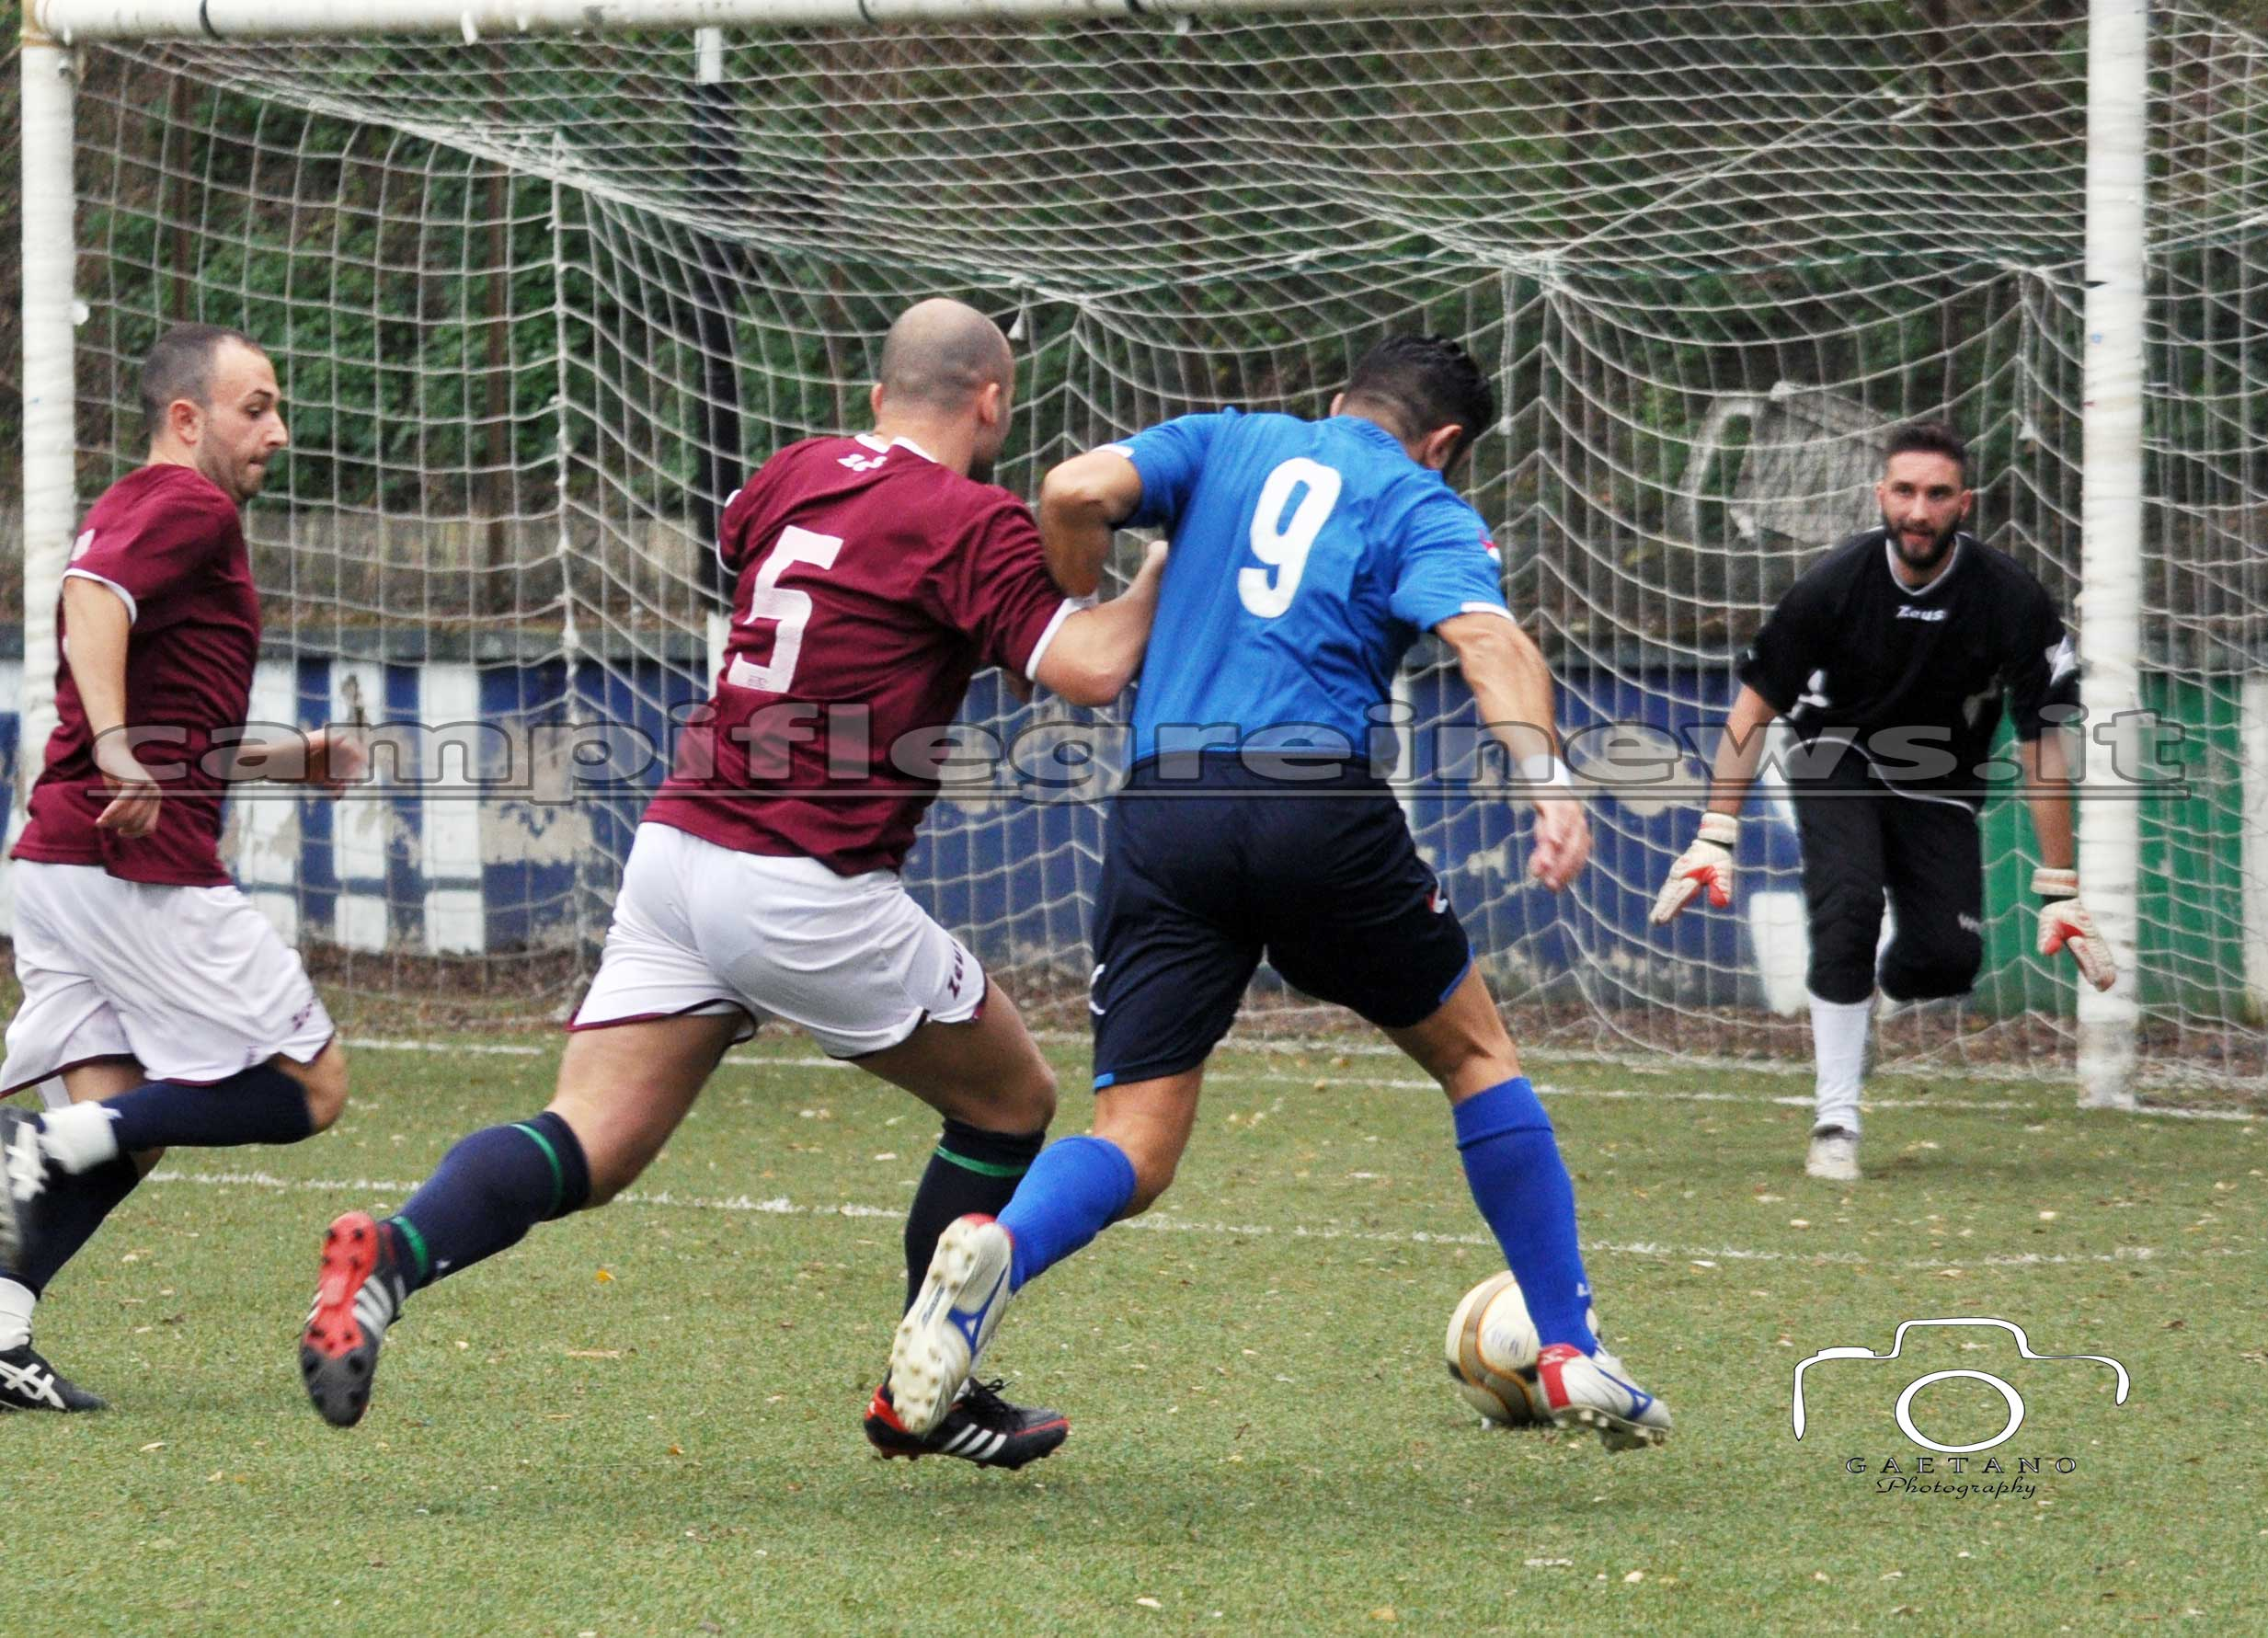 Pro Calcio Bacoli-San Giorgio - 16